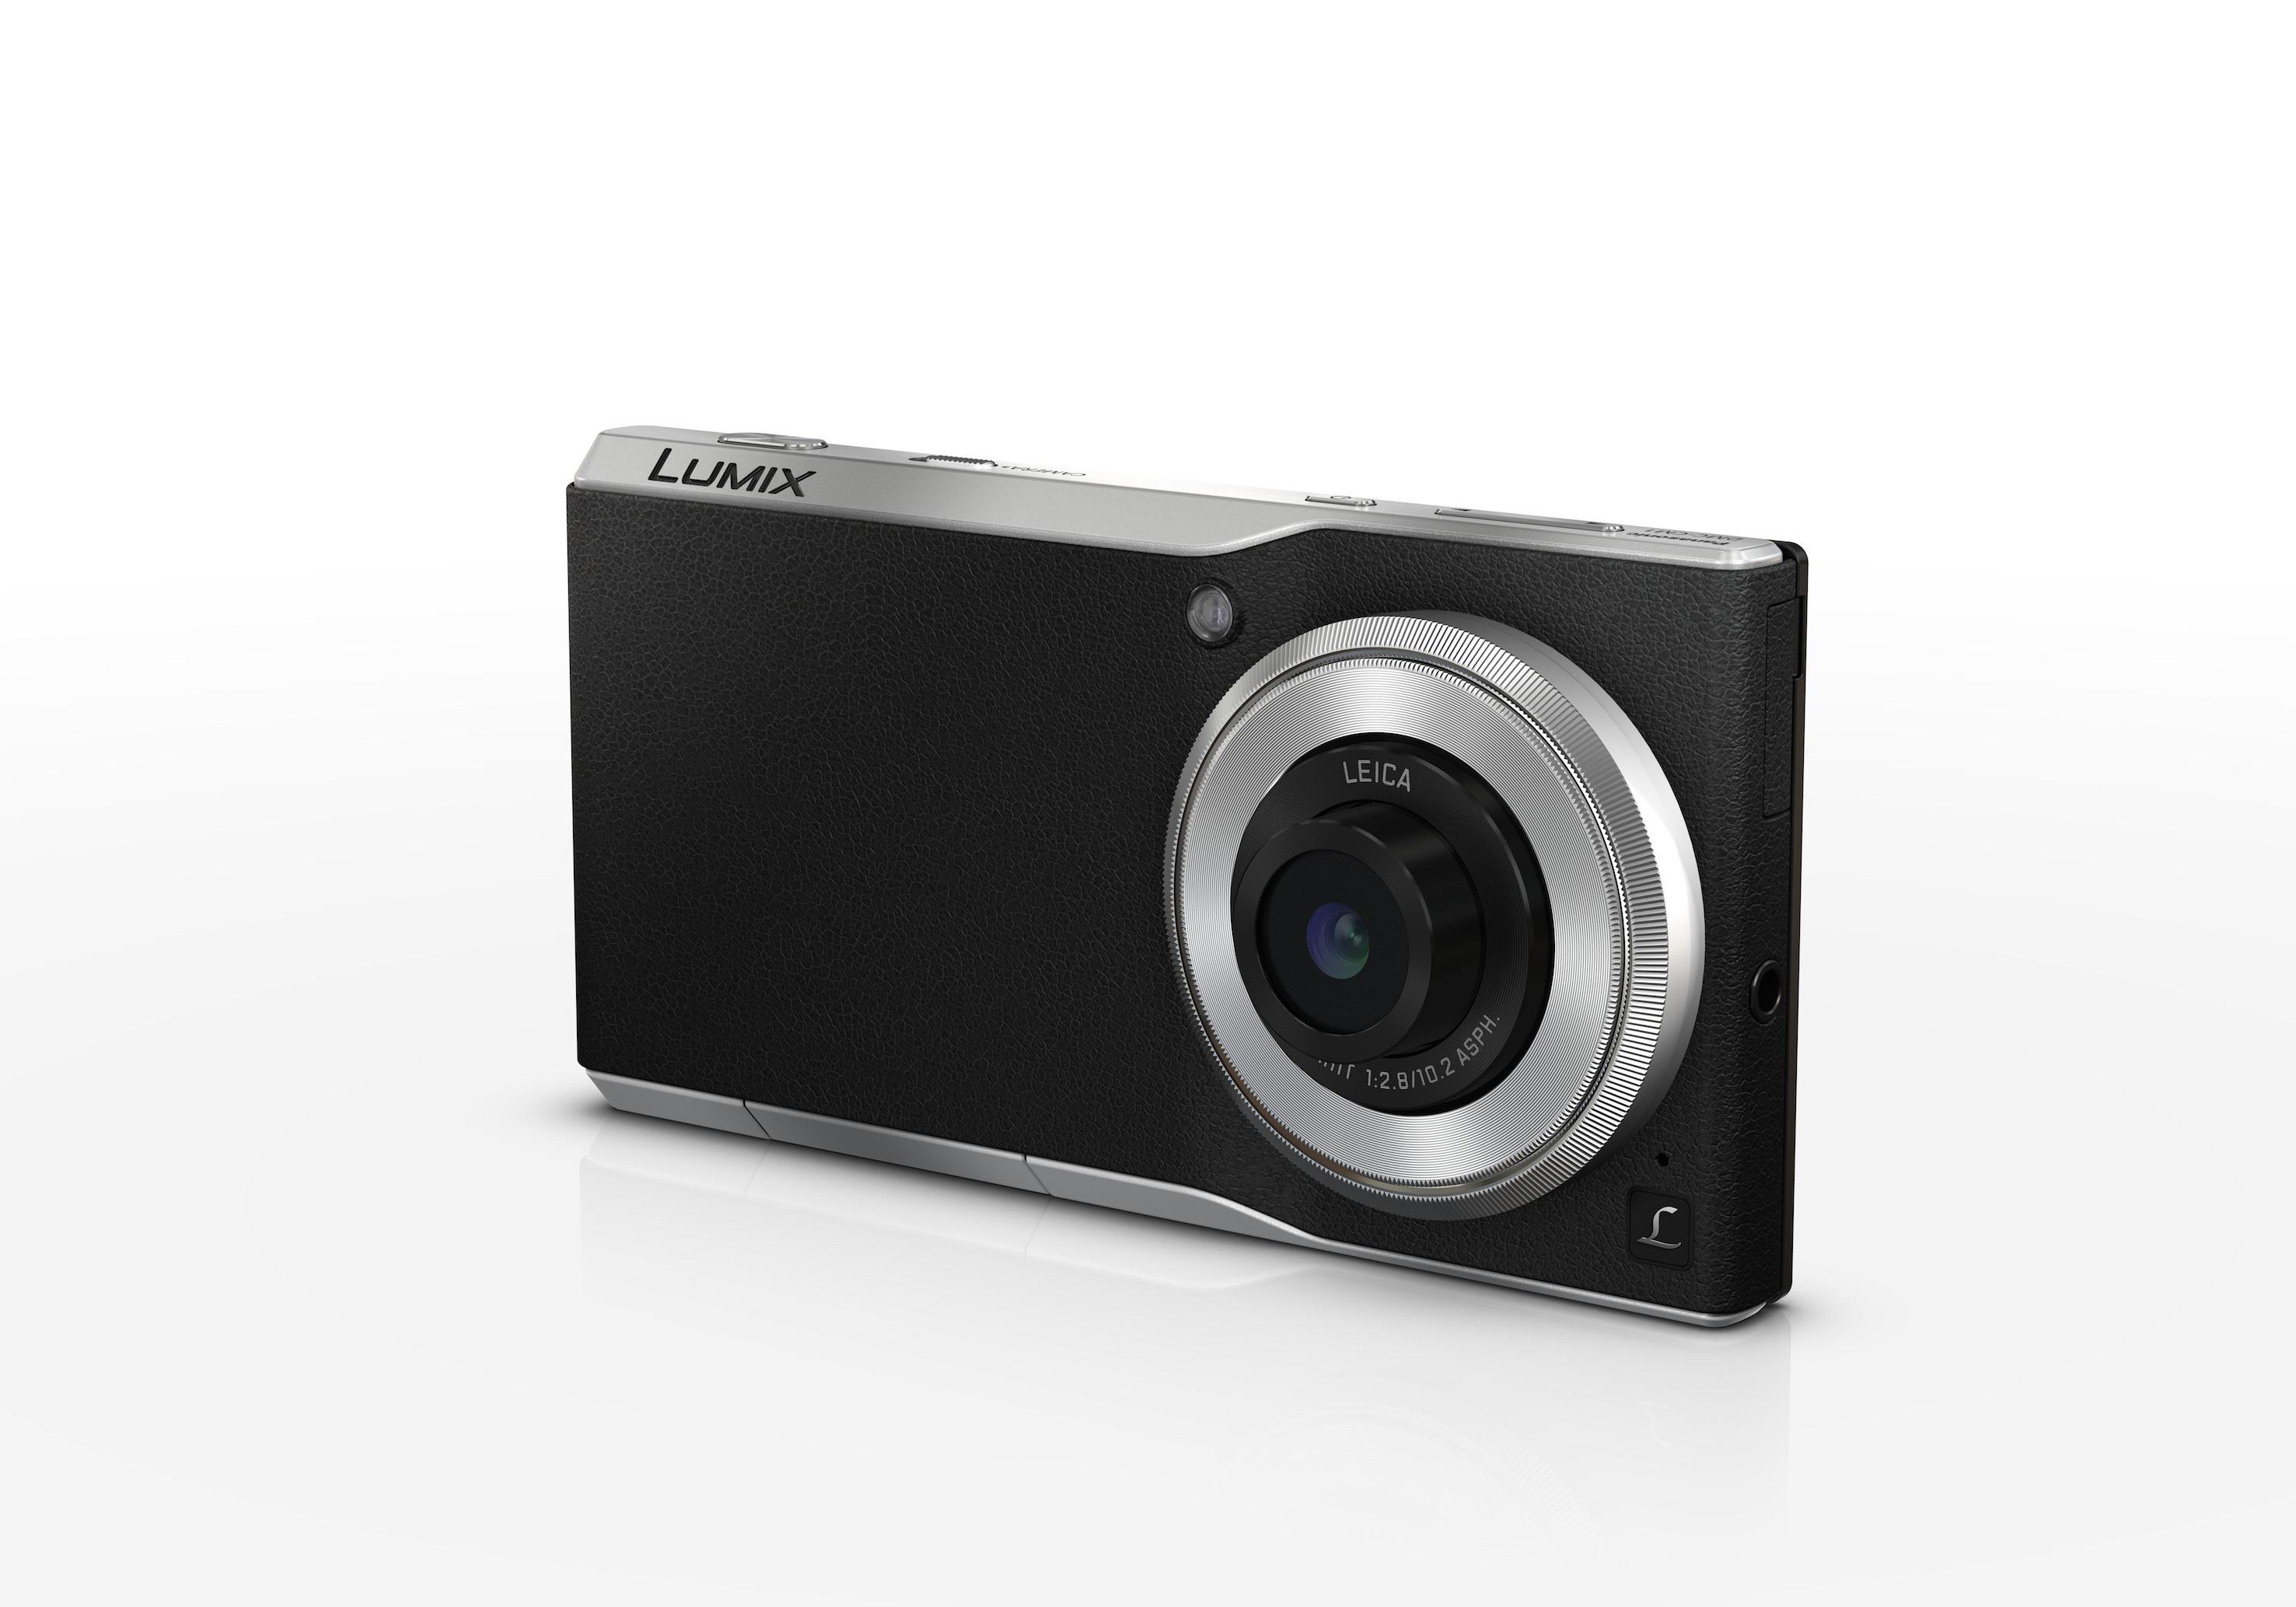 061_FY2014_LUMIX_Smart_Camera_CM1_OM3